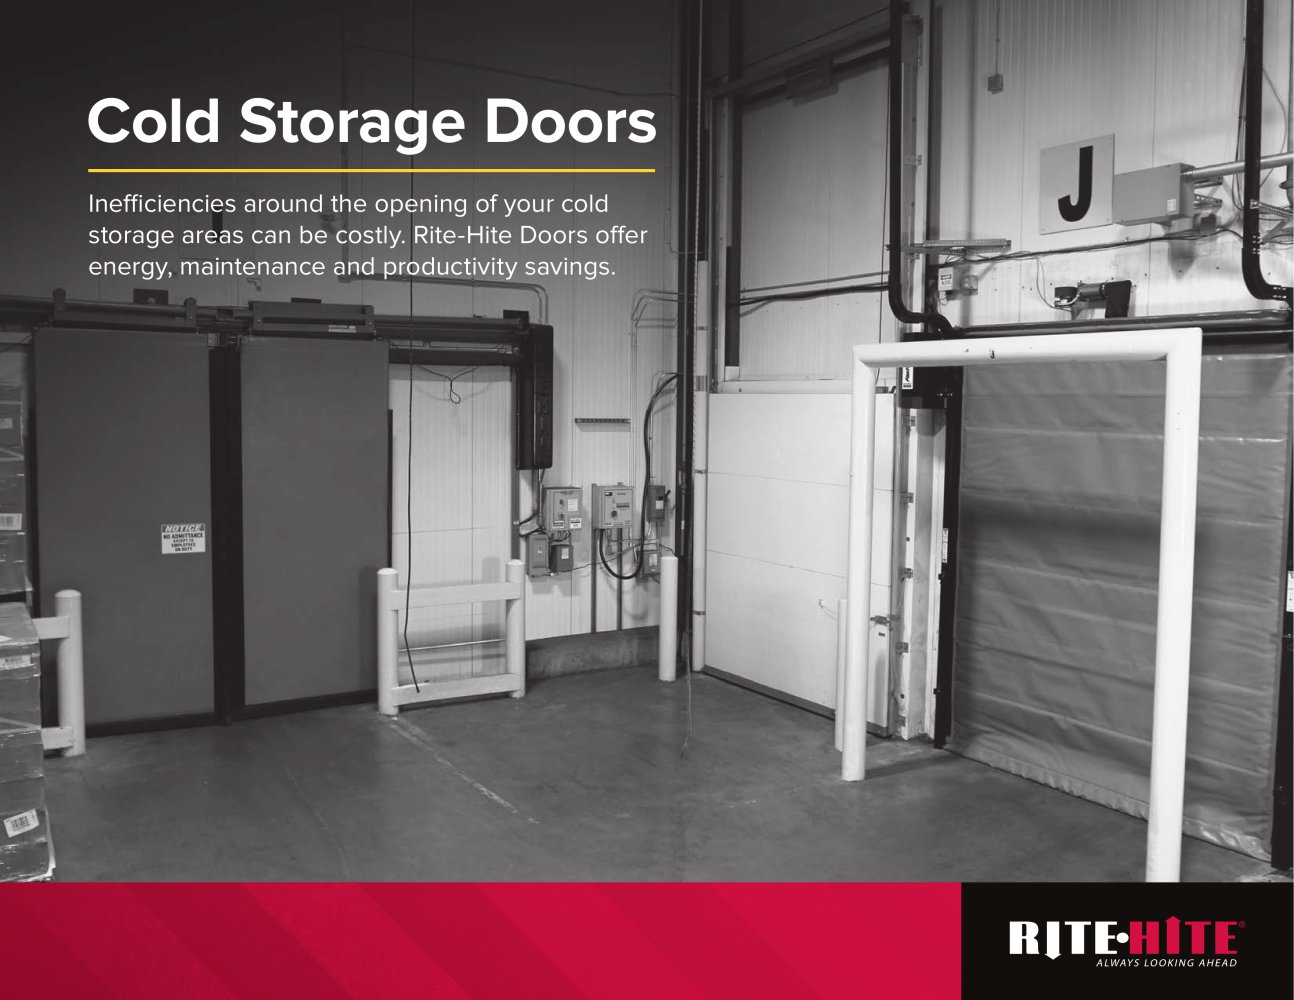 Cold Storage Doors - 1 / 4 Pages & Cold Storage Doors - Rite-Hite - PDF Catalogue | Technical ... pezcame.com